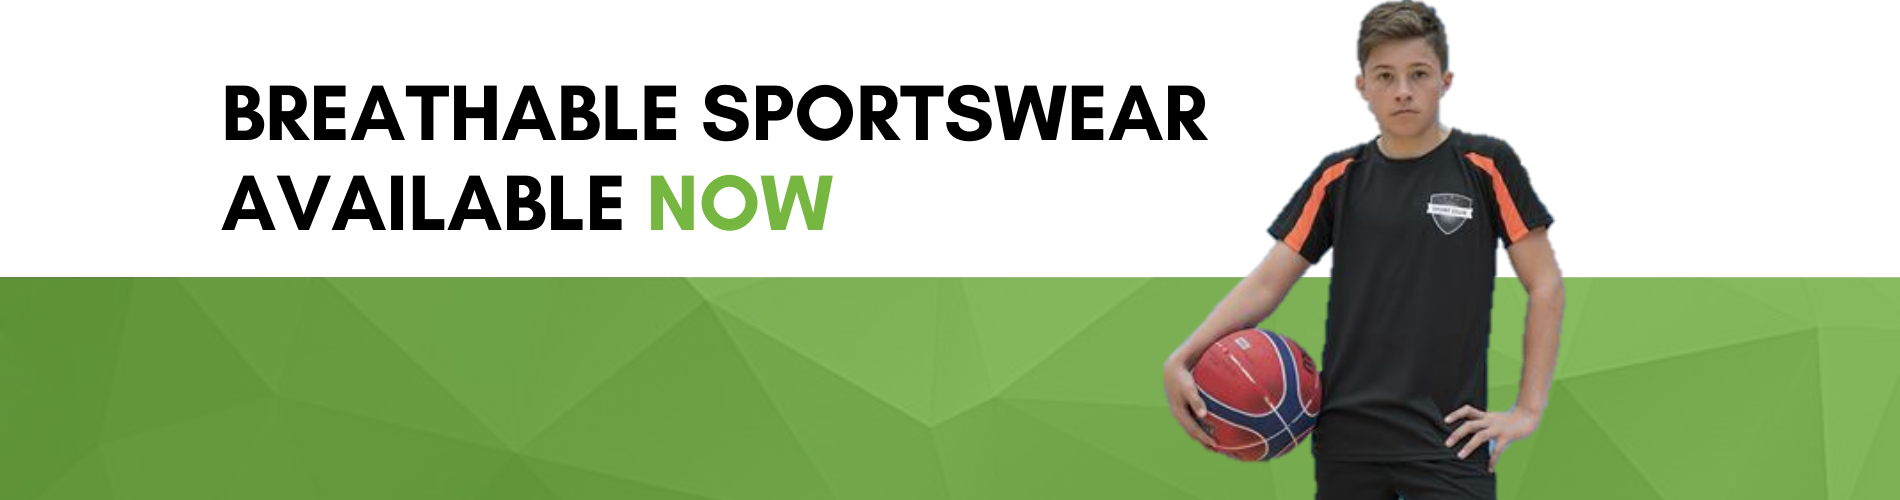 Breathable sportswear for your school | School Trends